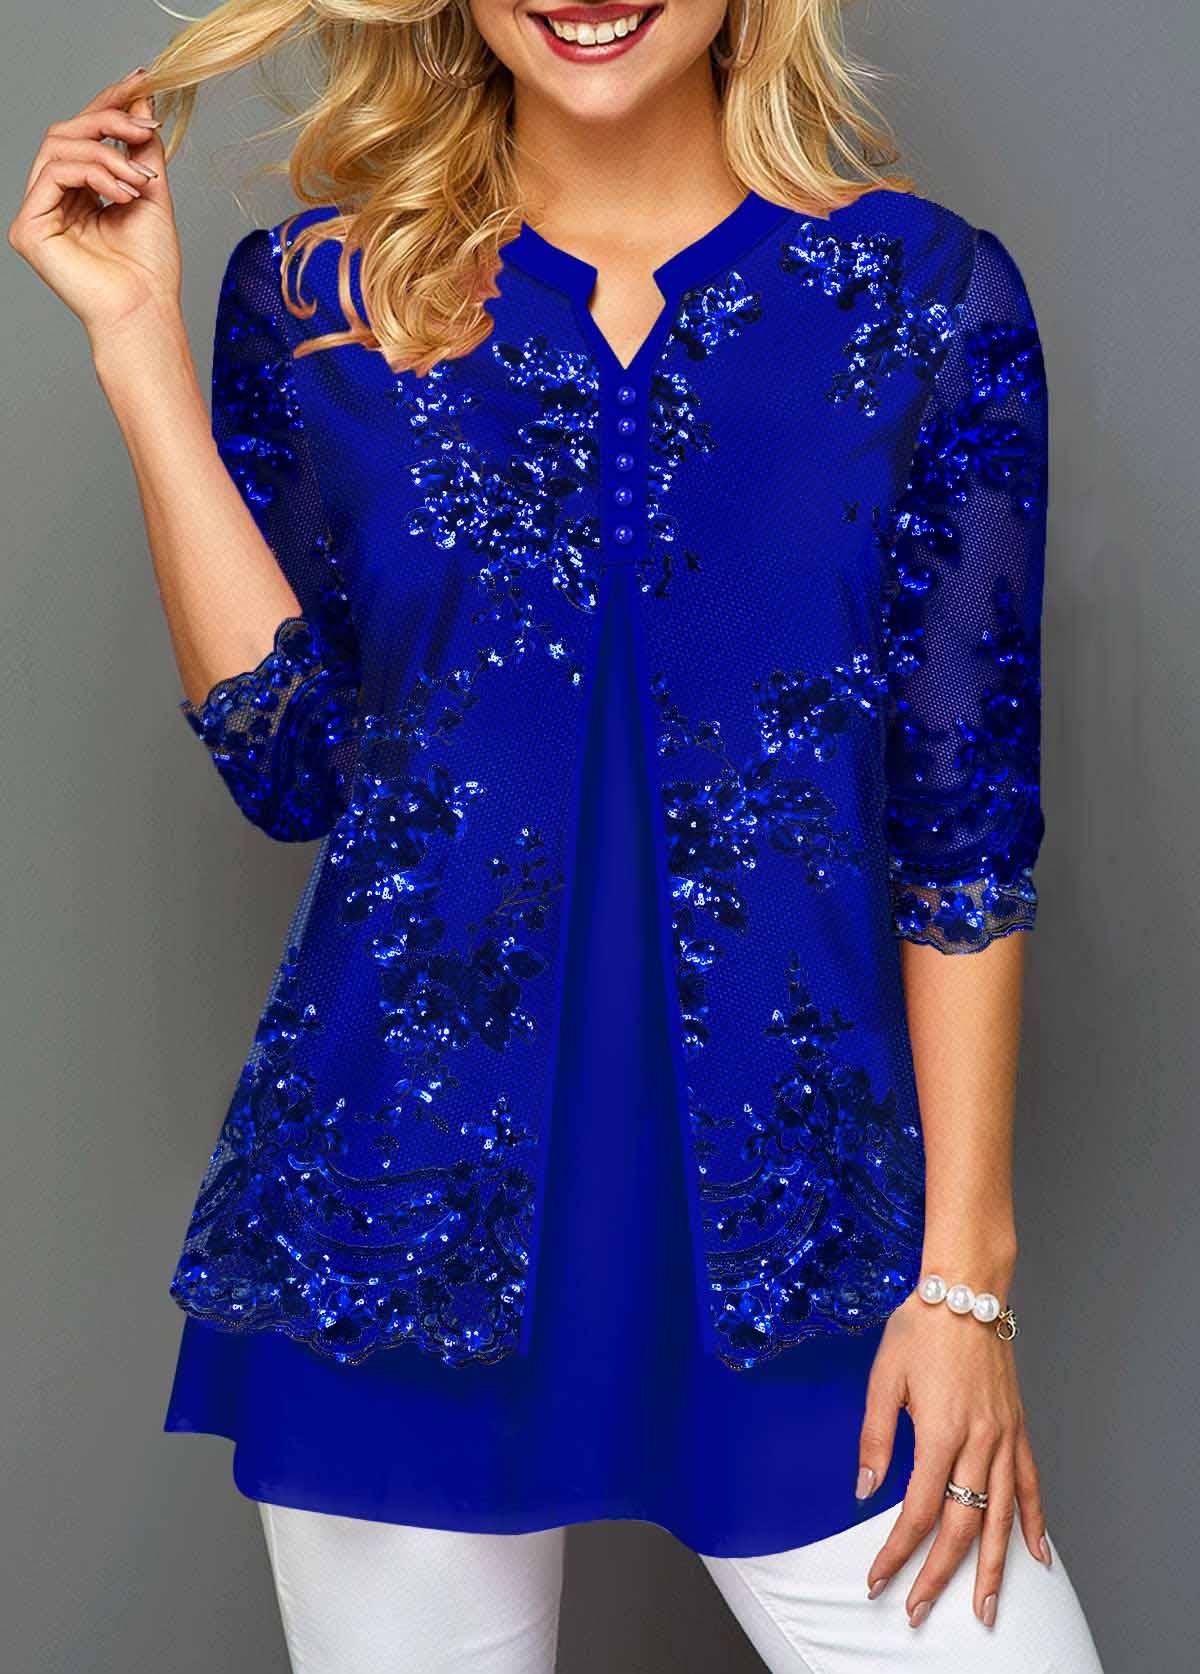 ROTITA Lace Stitching Split Neck Sequin T Shirt